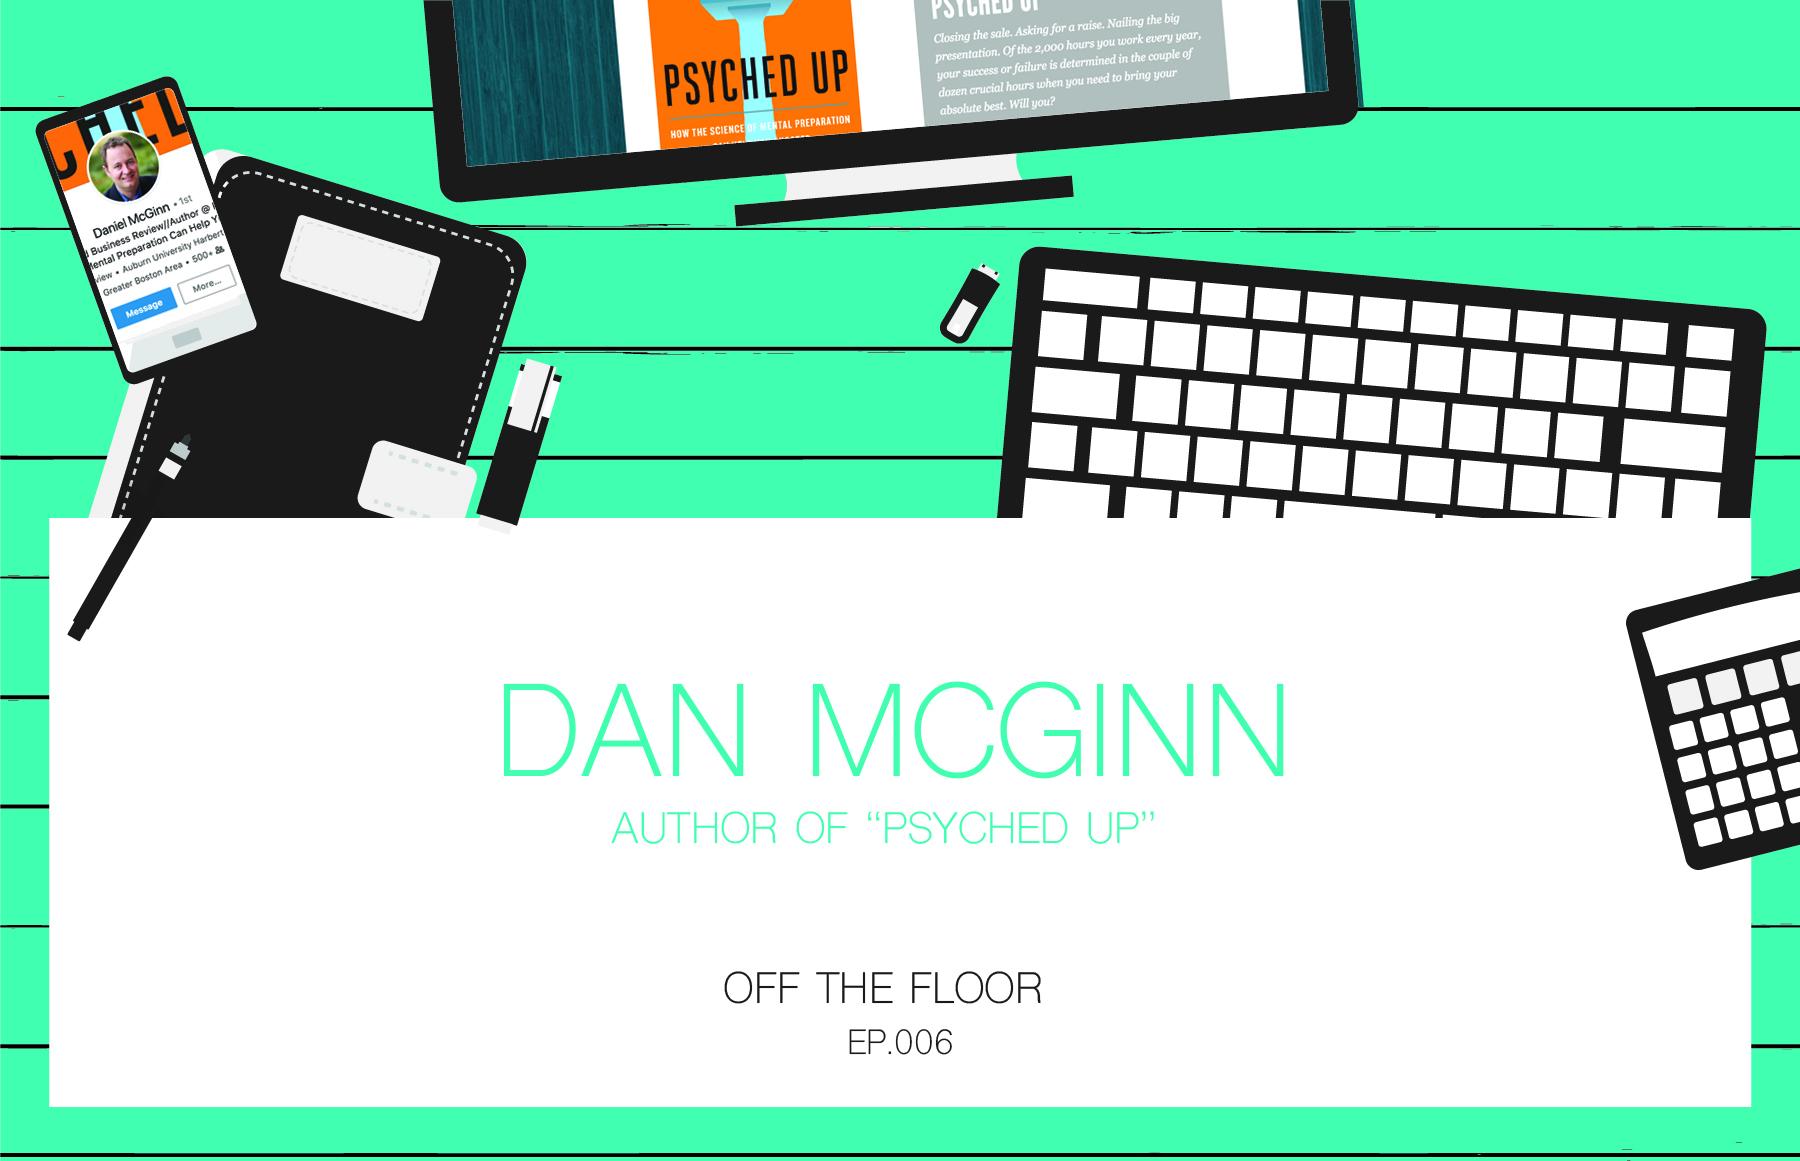 dan-mcginn-off-the-floor.jpg